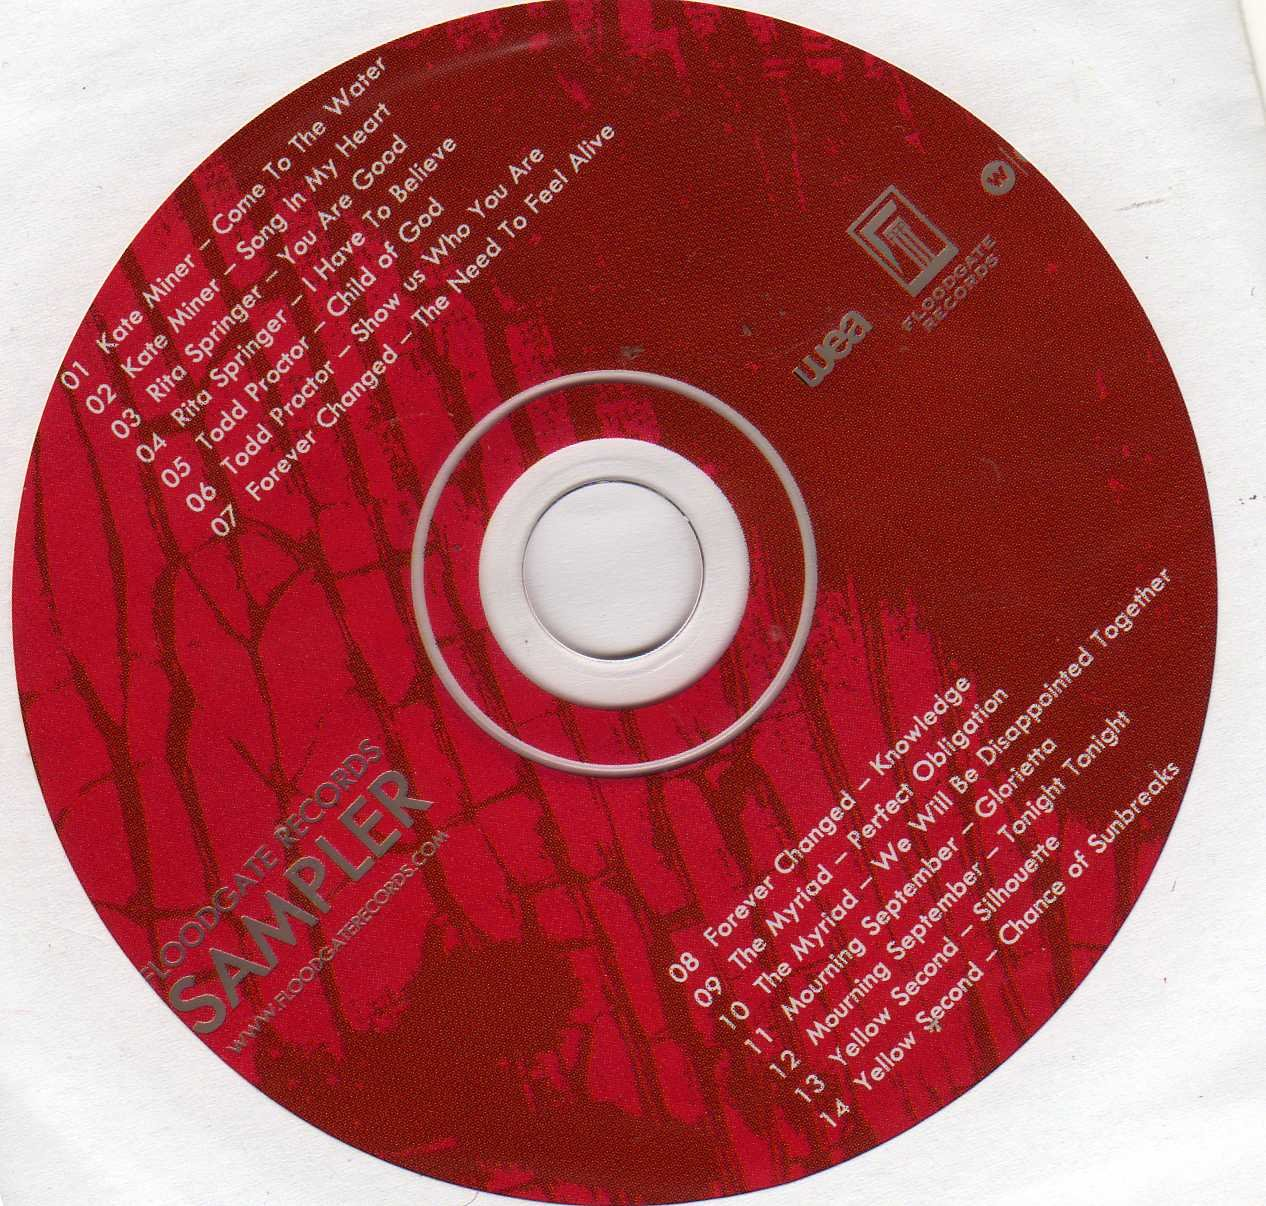 Floodgate Records Sampler (Audio CD)